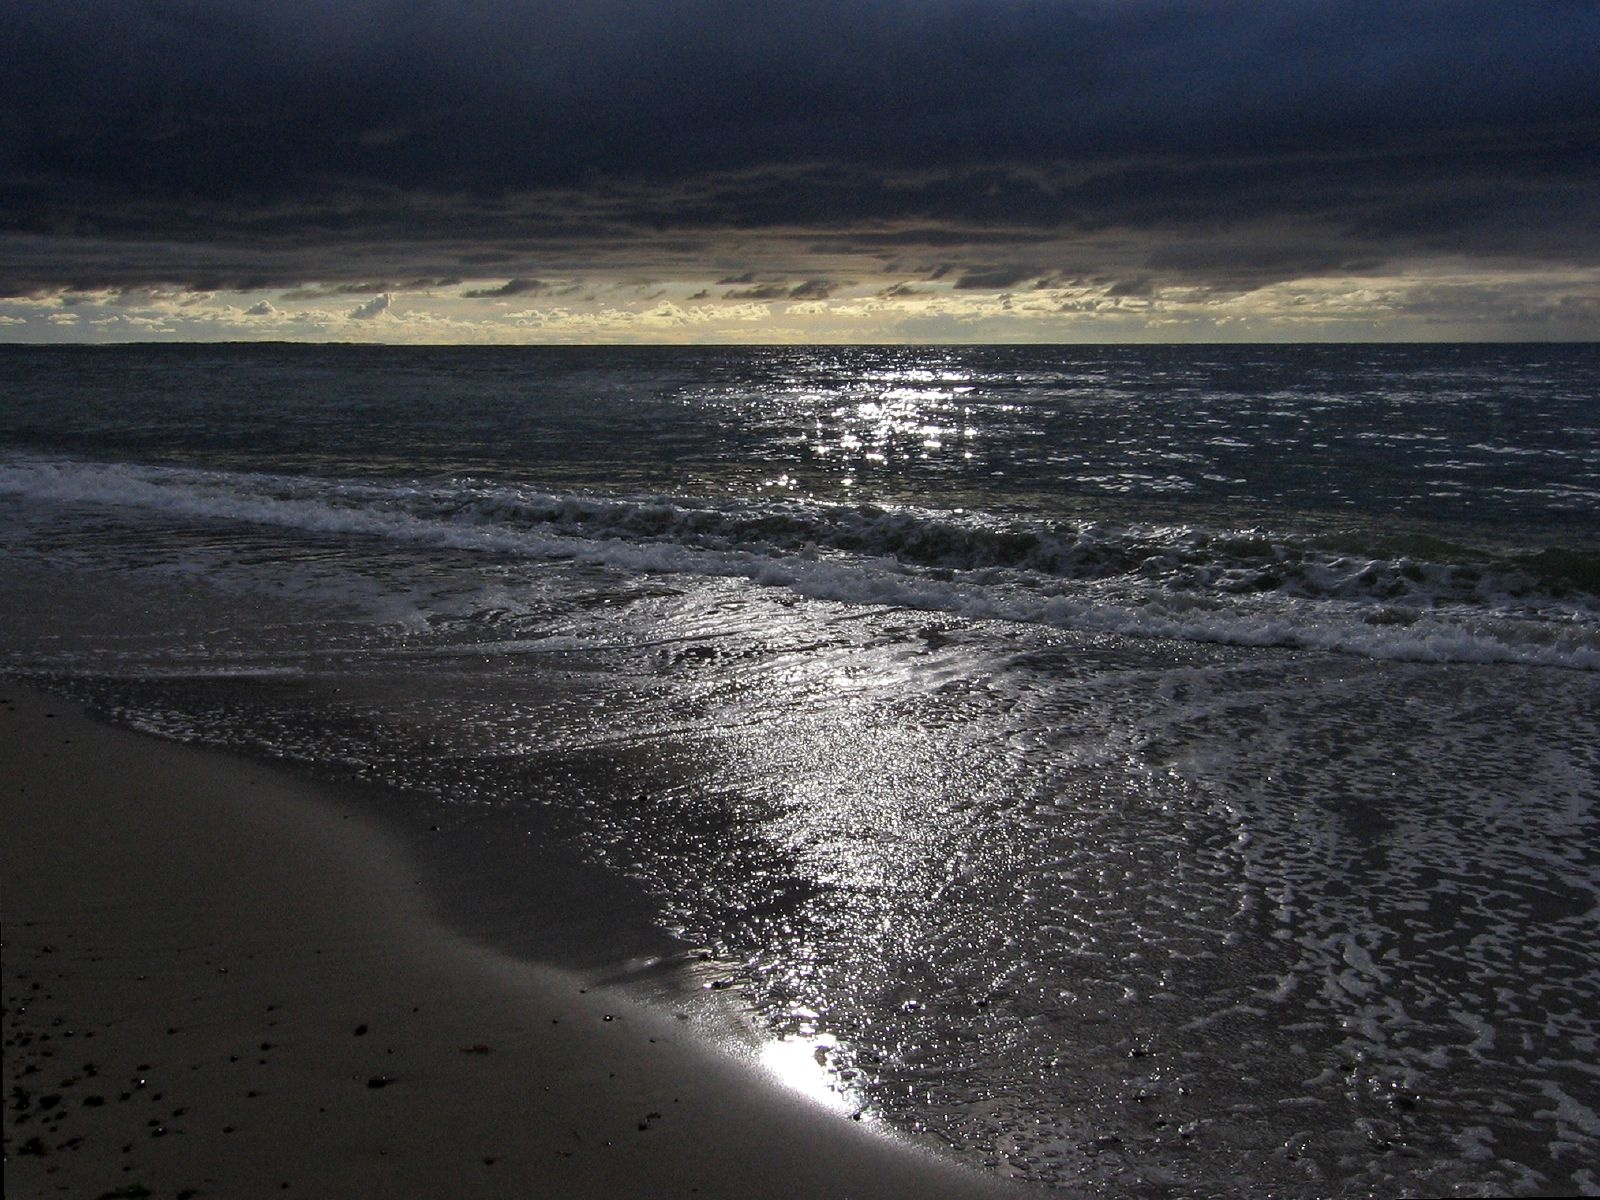 animal jungle wonderful evening on the beach of free beaches 669025